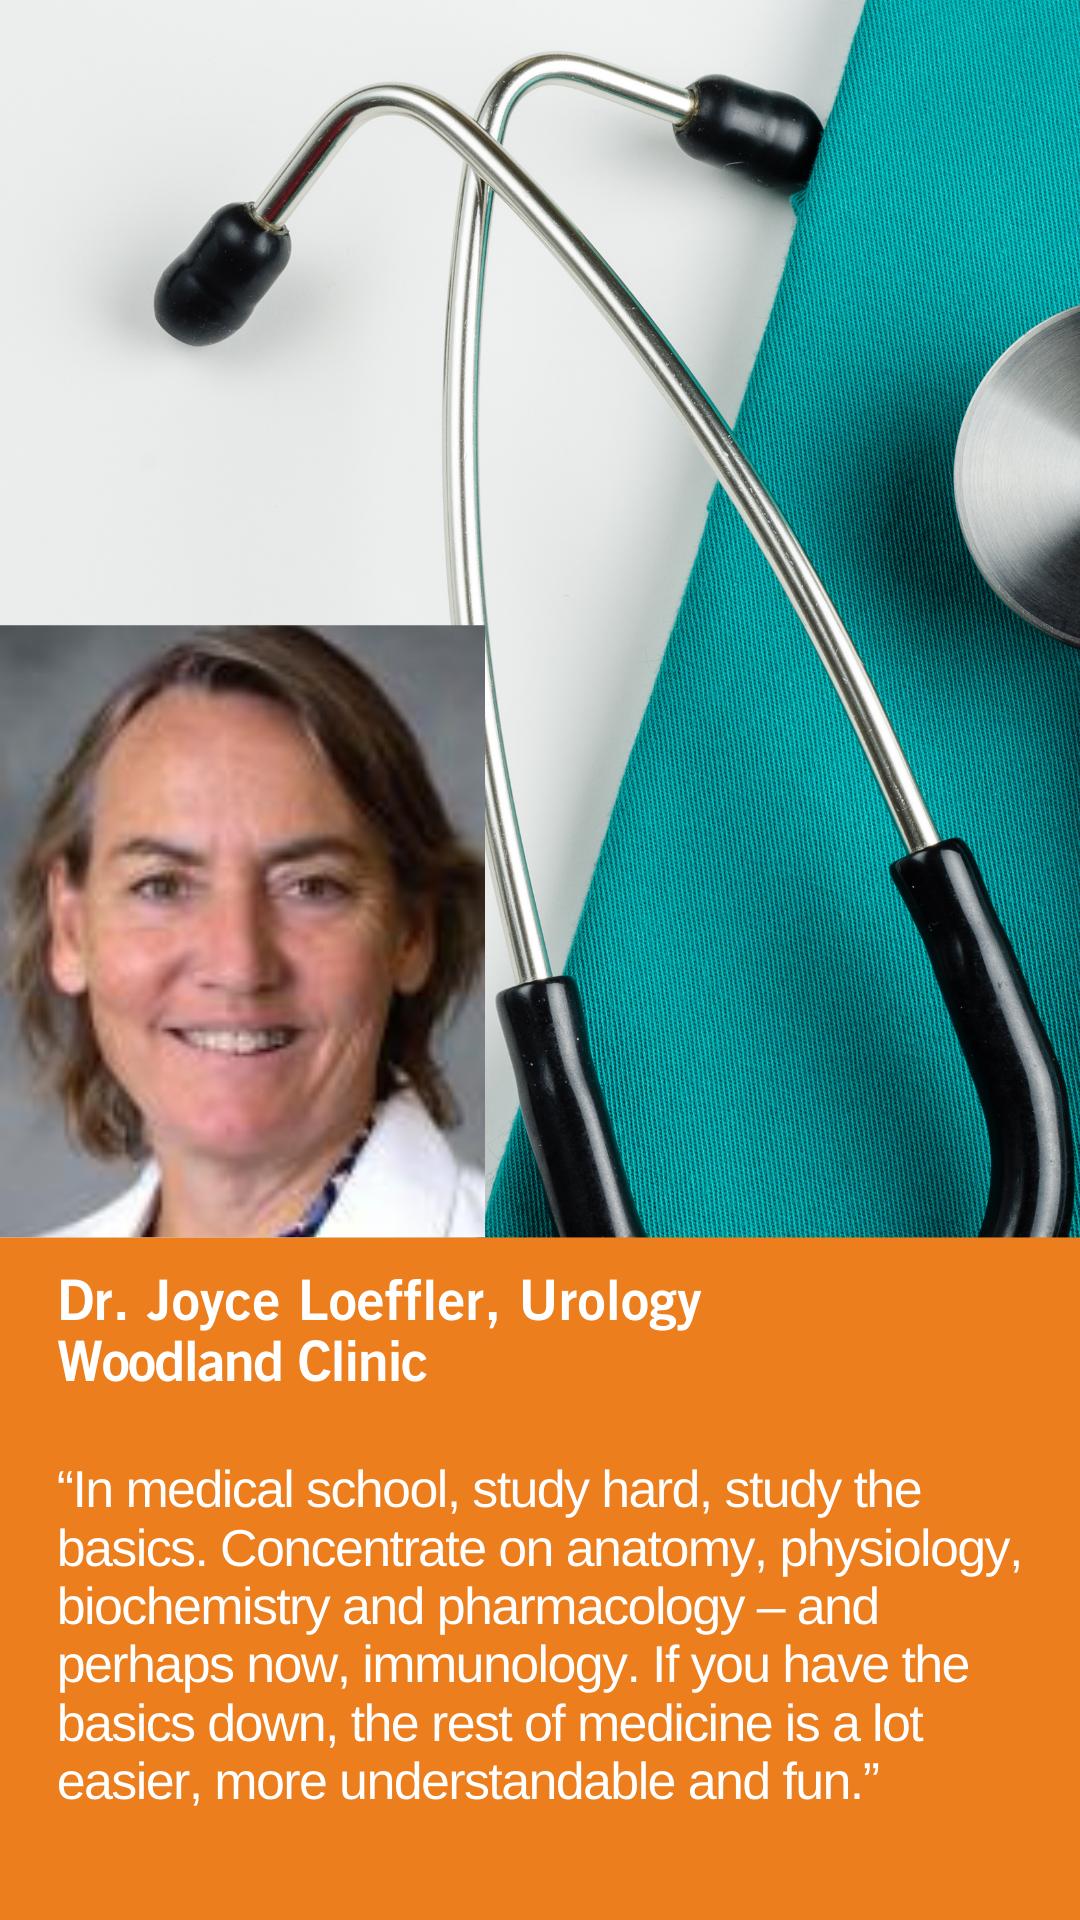 Joyce Loeffler, MD, Urology, Woodland Clinic